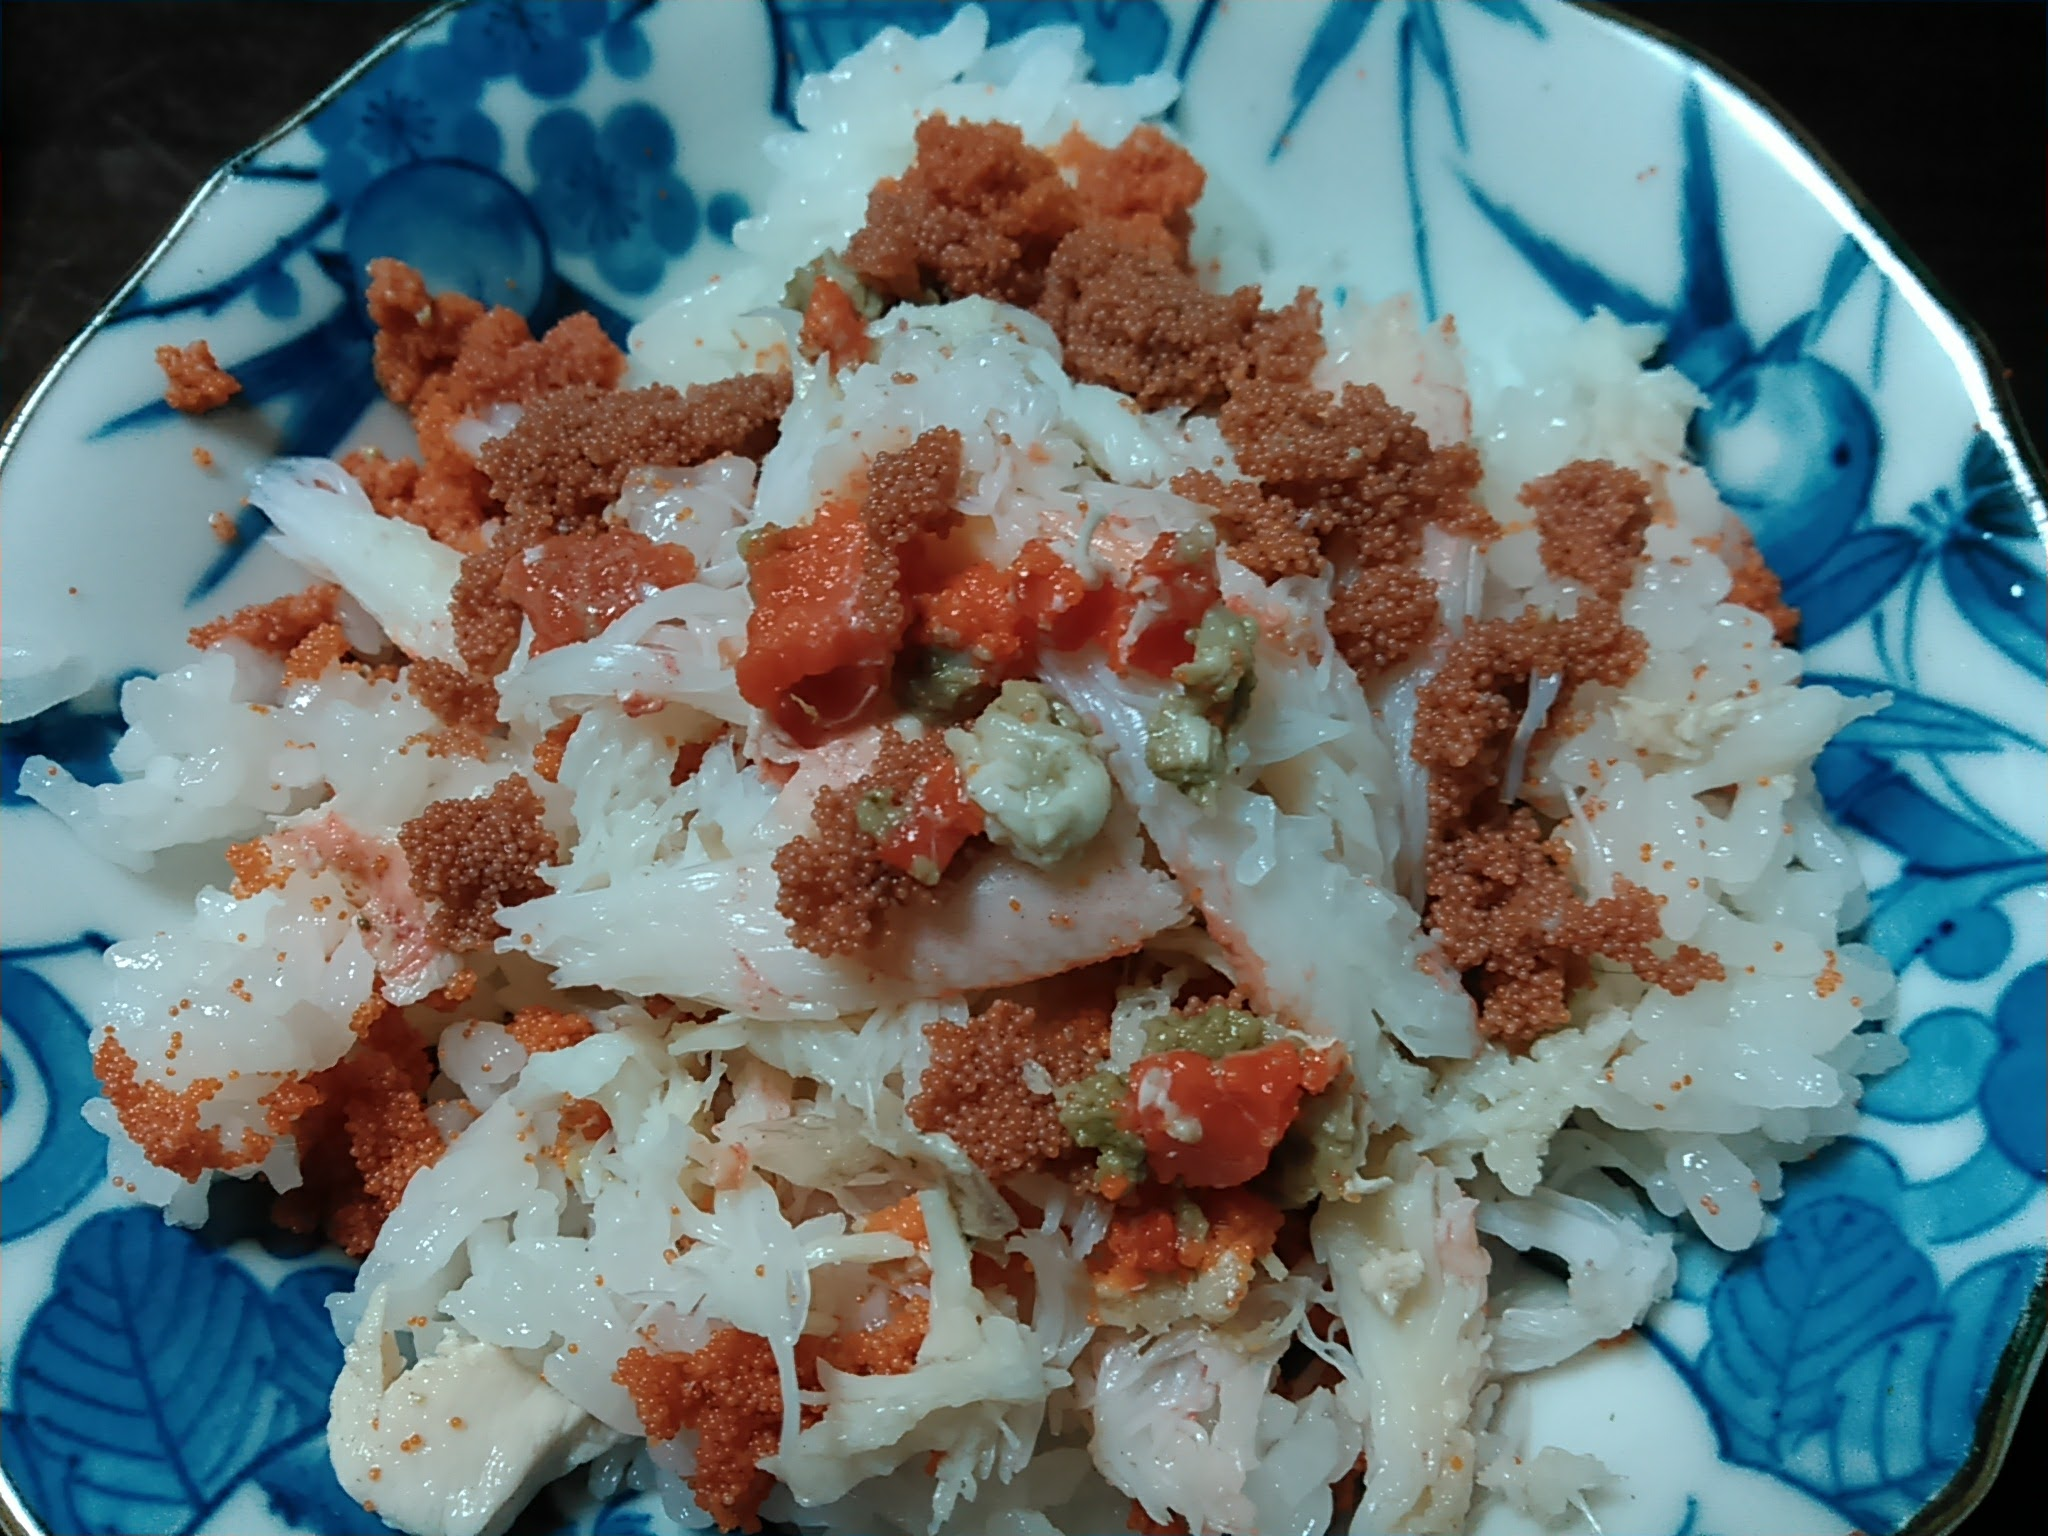 勢子ガニ寿司